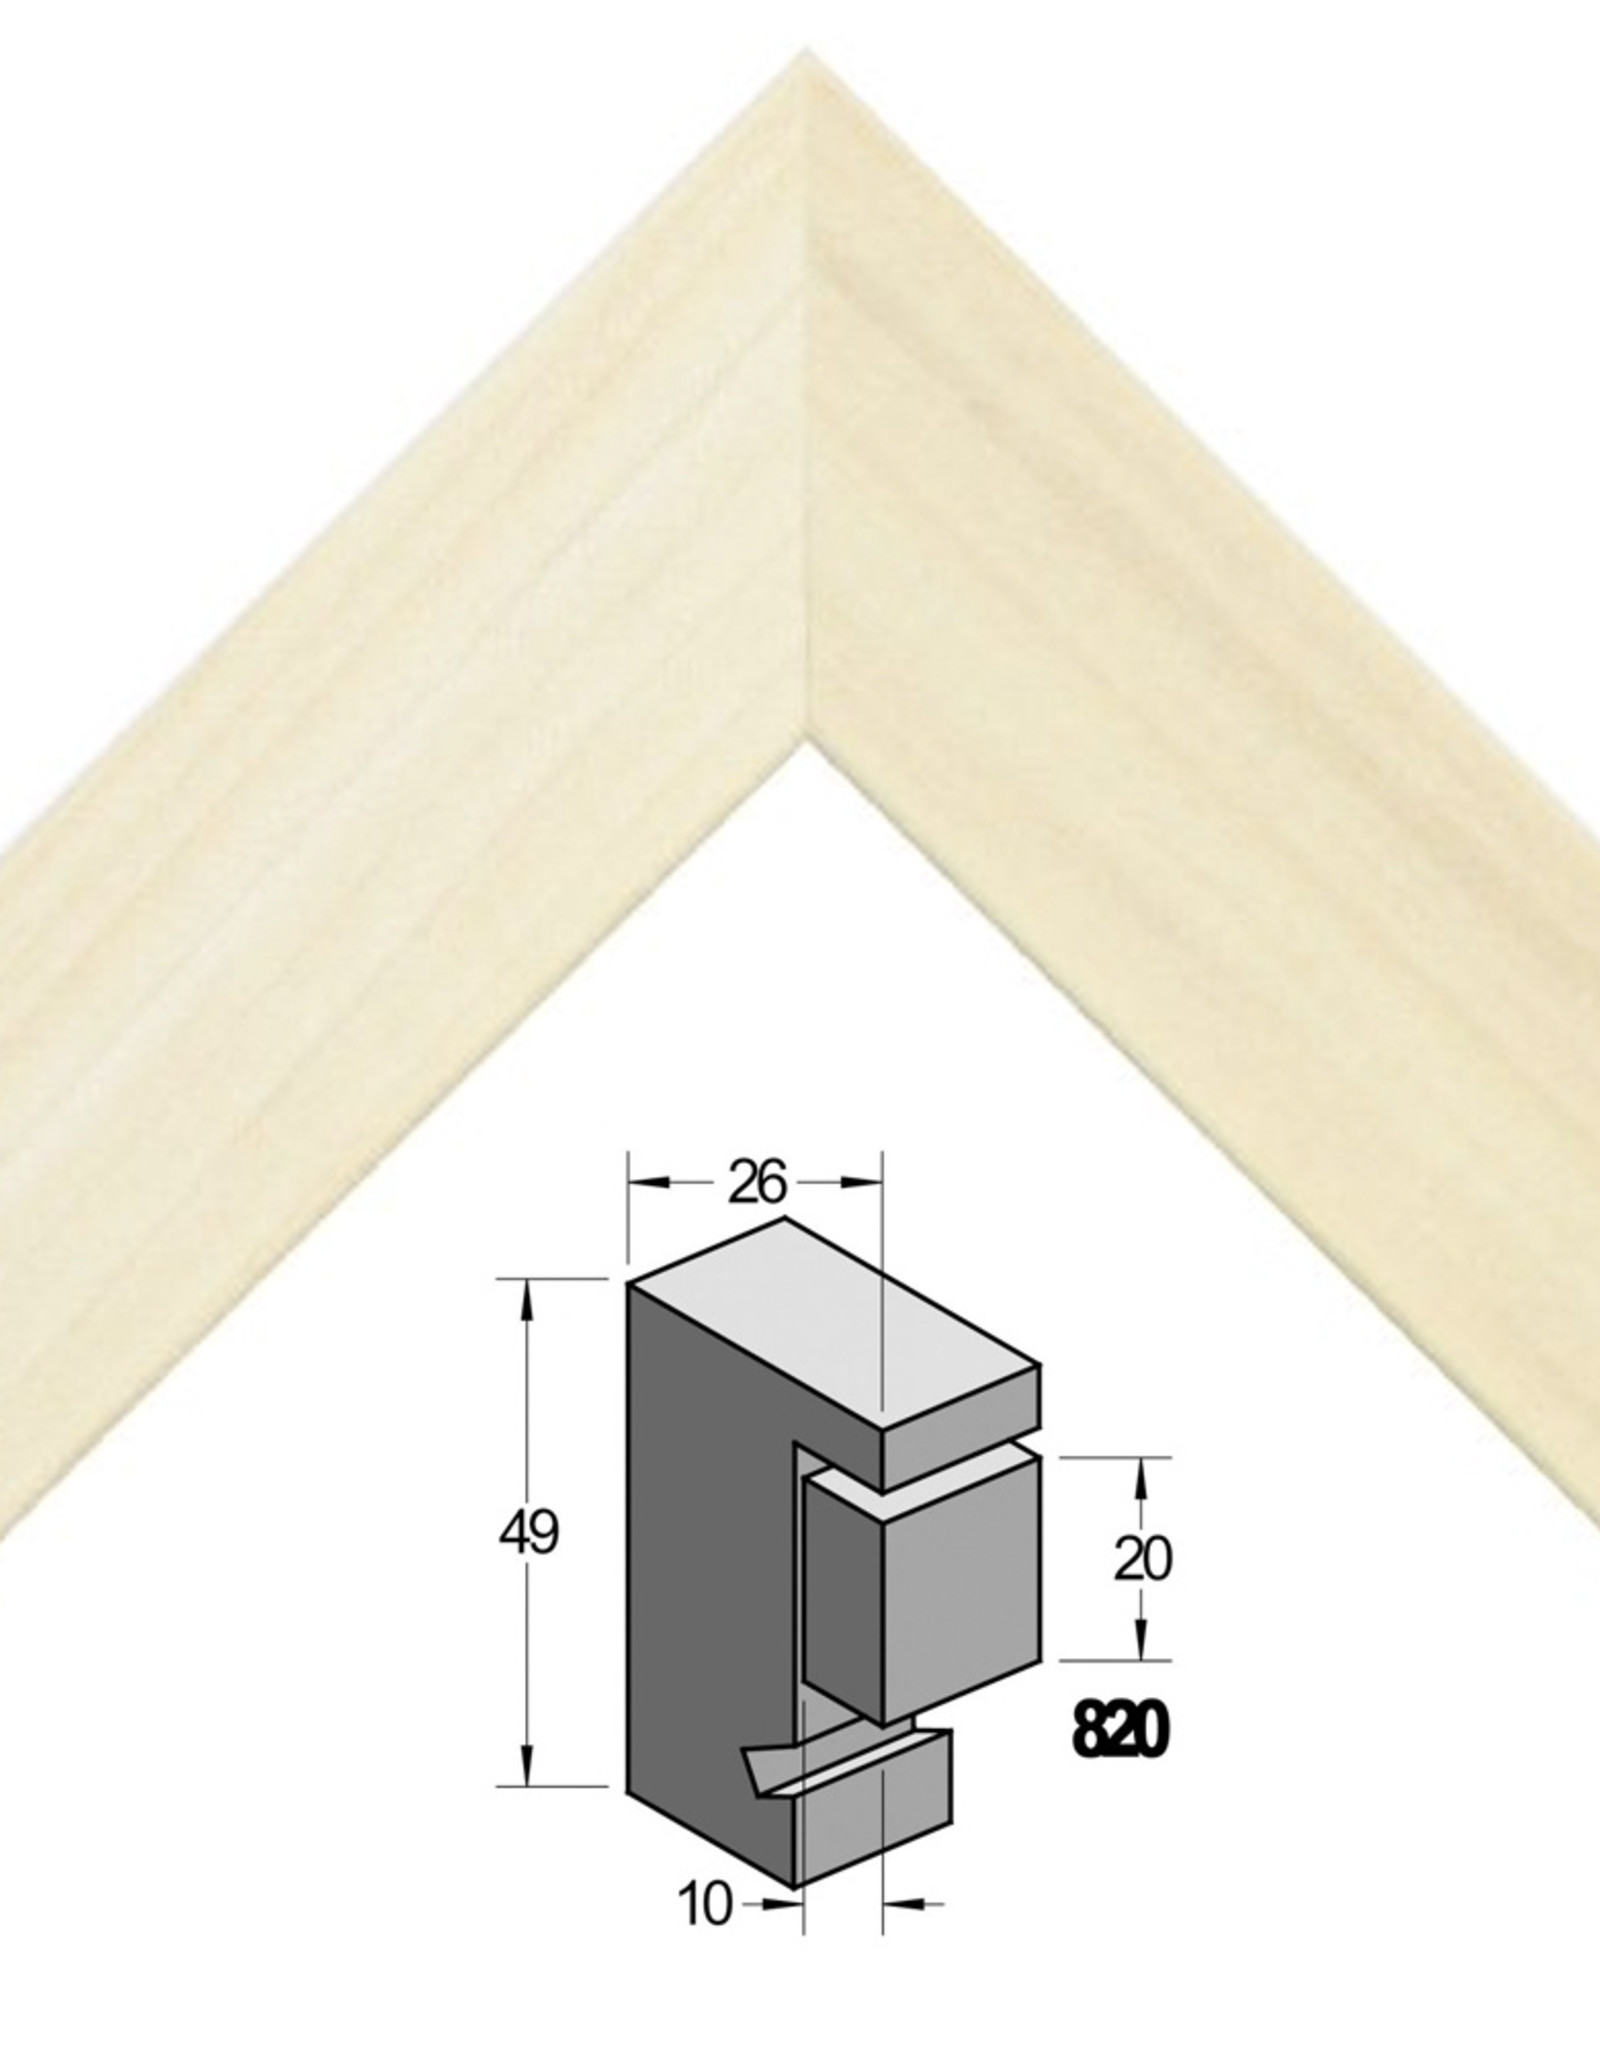 2x Wissellijst Verdiept 80x100cm Populier Ongelakt Barth profiel 26x49mm(820) sponning 20mm